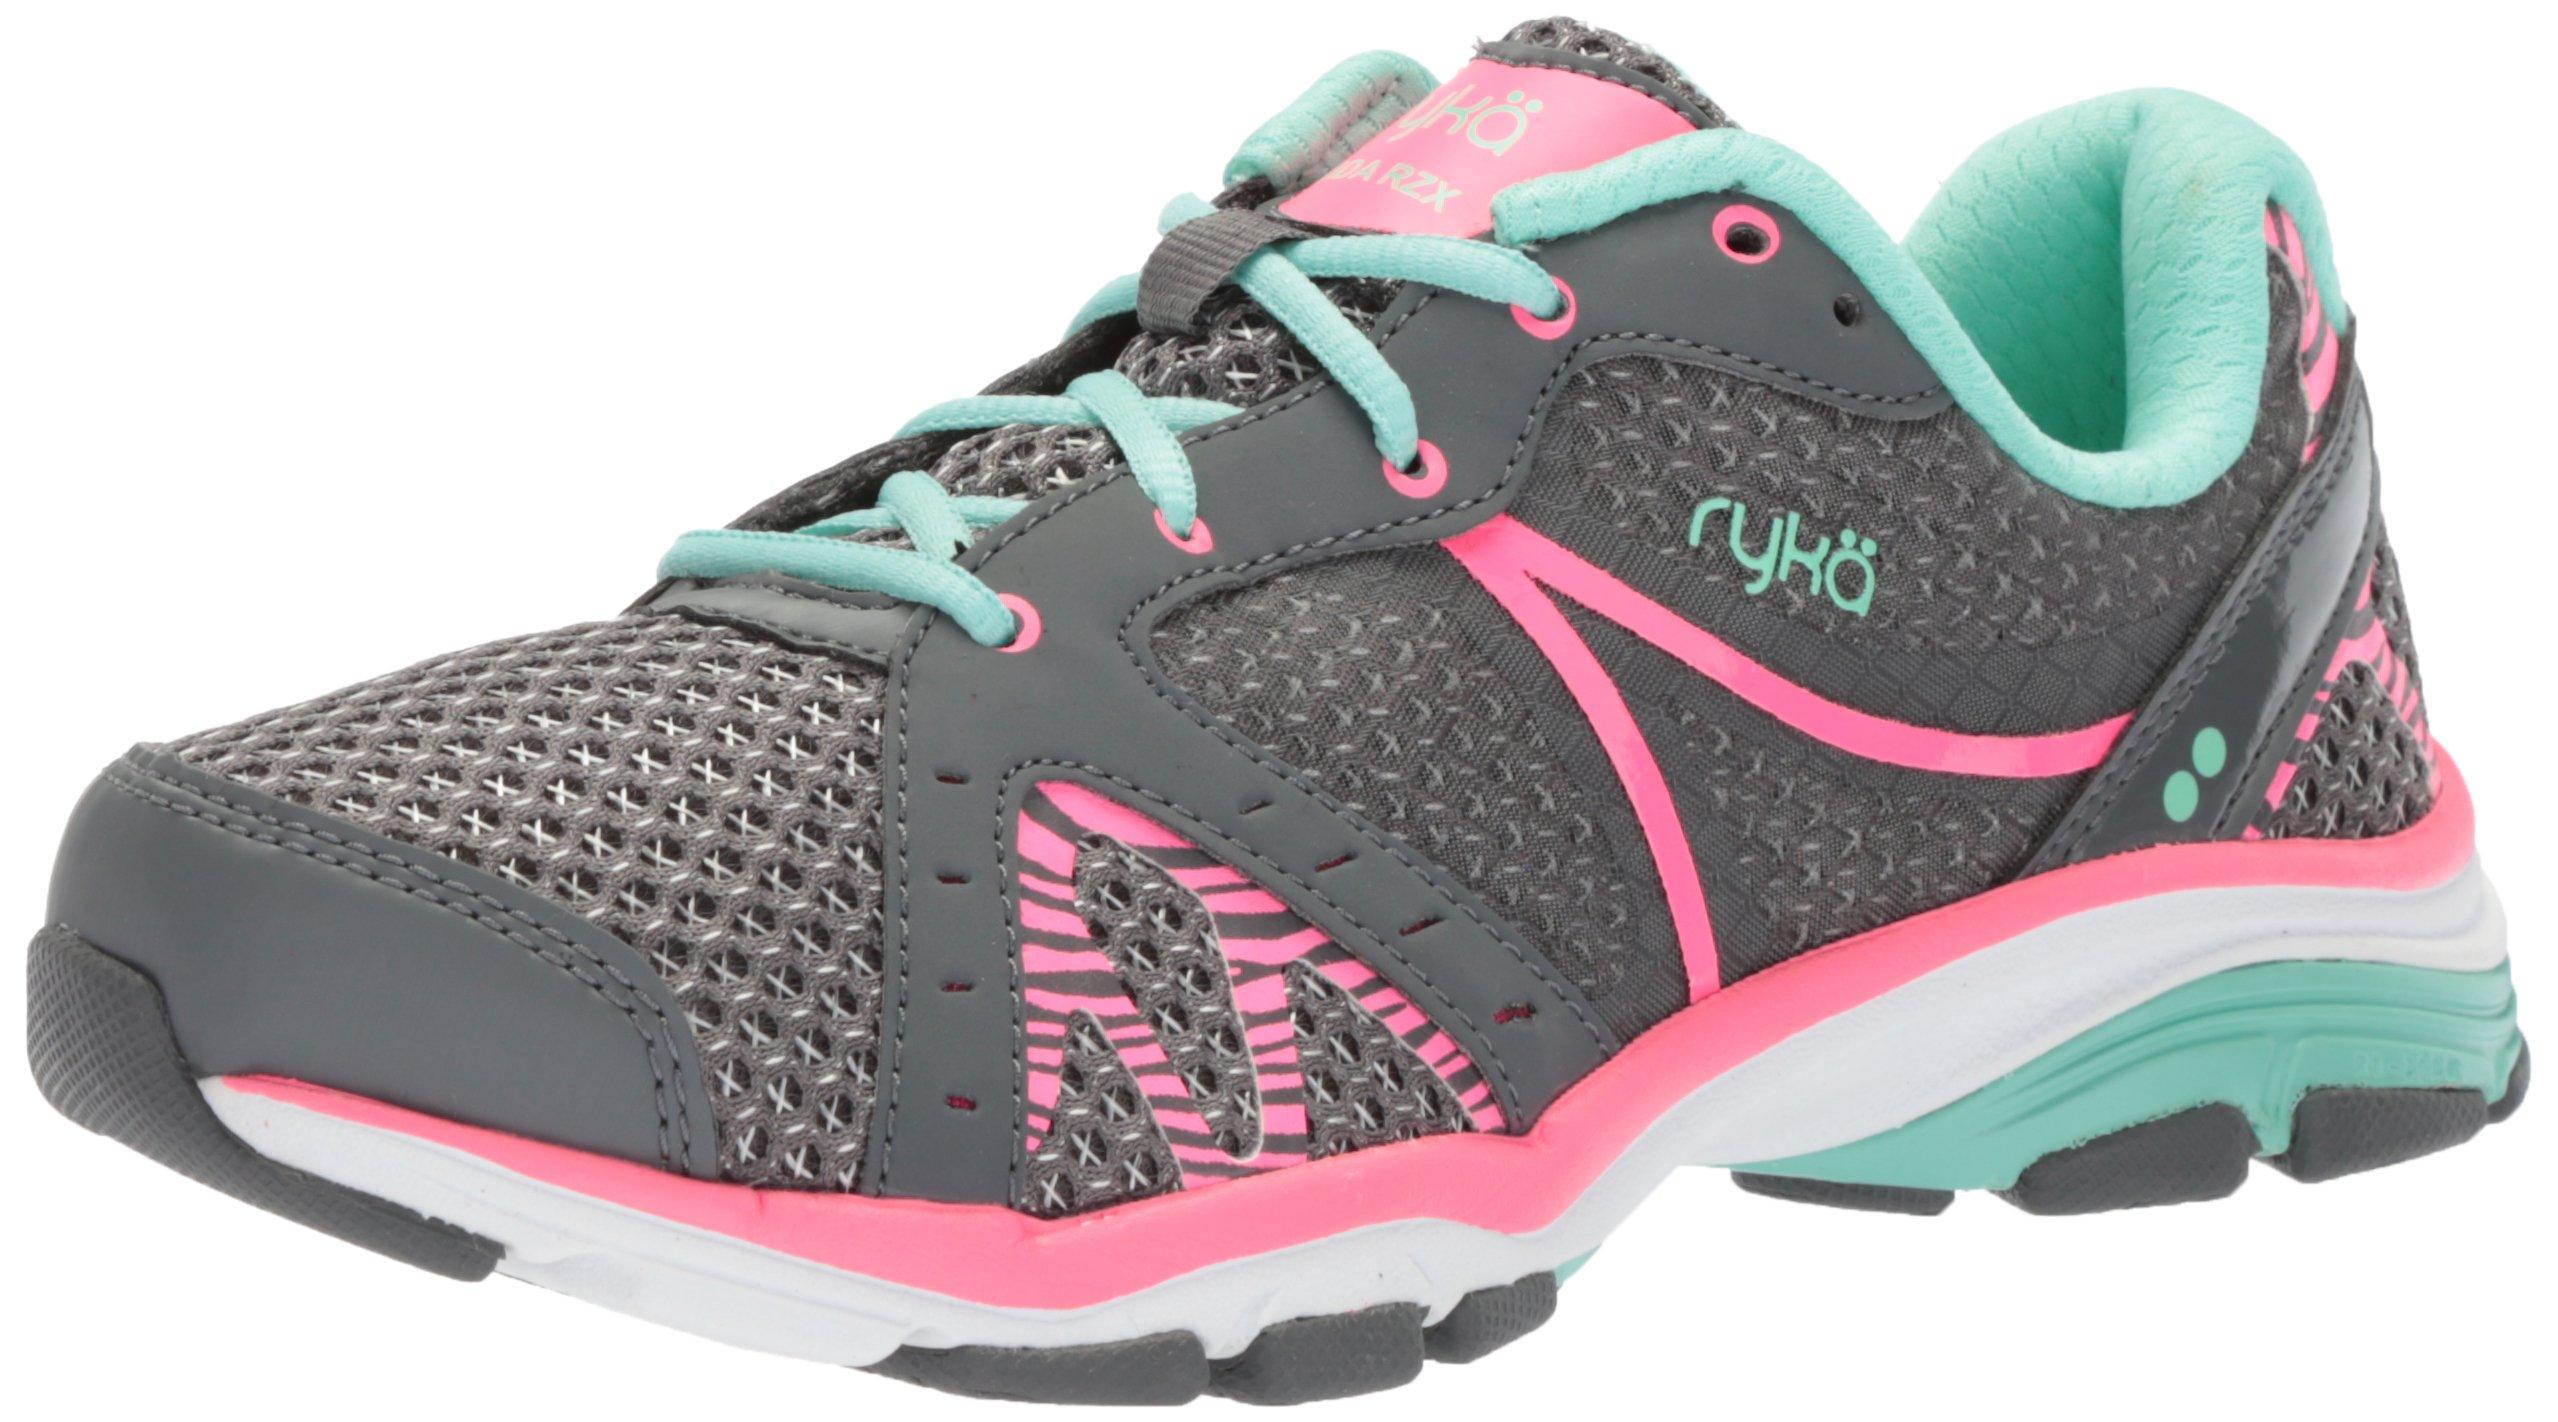 Ryka Women's Vida RZX Cross Trainer, Iron Grey/Hyper Pink/Yucca Mint, 8 M US